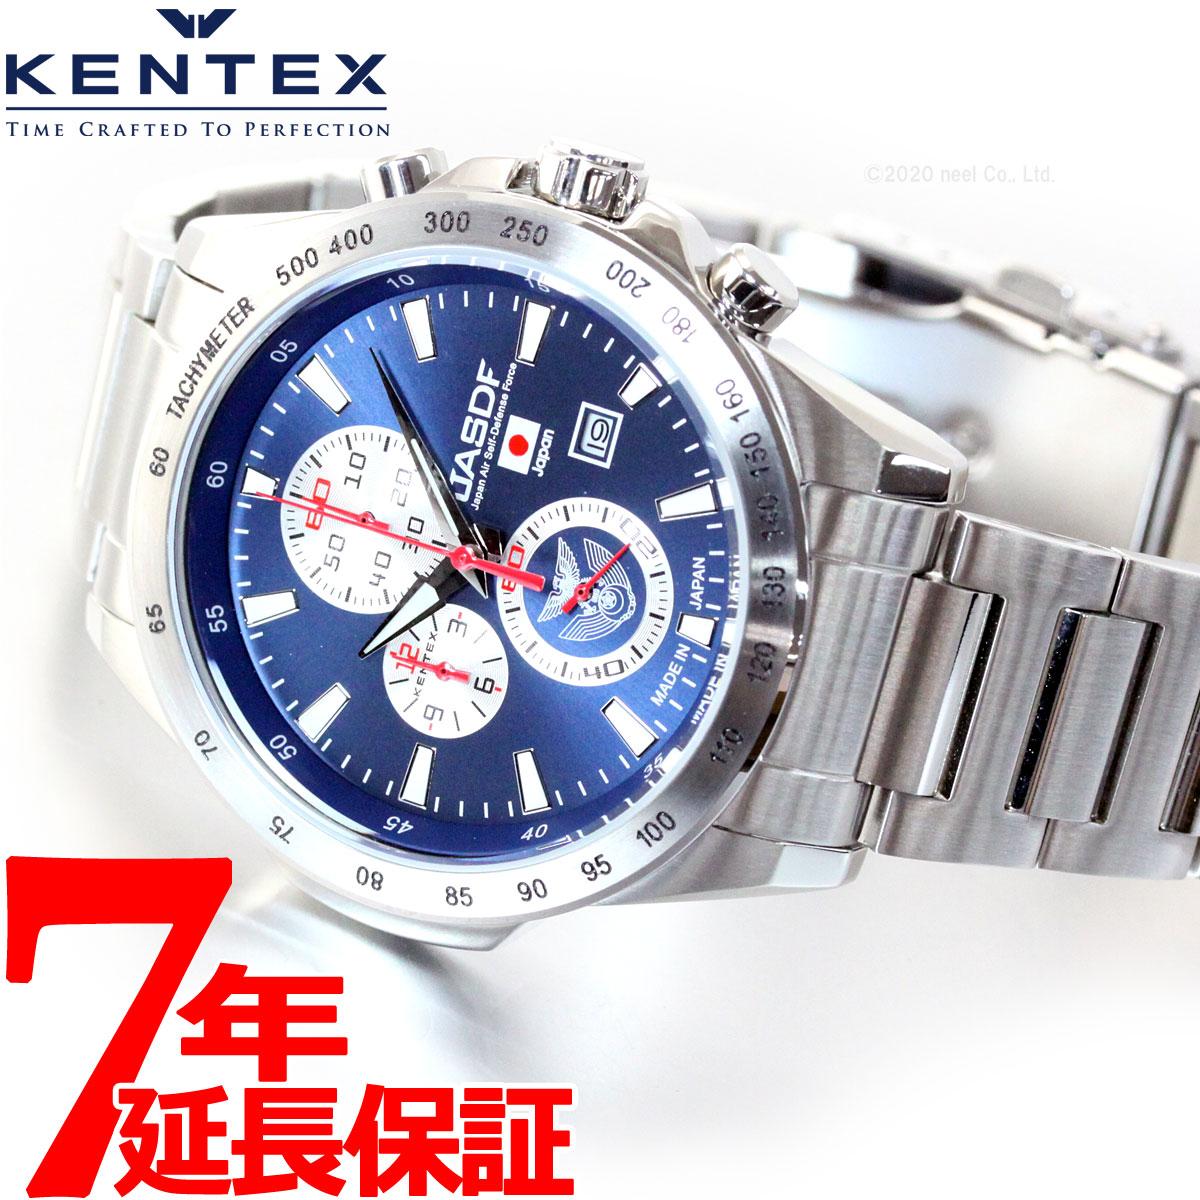 KENTEX ケンテックス 腕時計 メンズ JASDF PRO 自衛隊モデル 航空自衛隊 クロノグラフ S648M-01